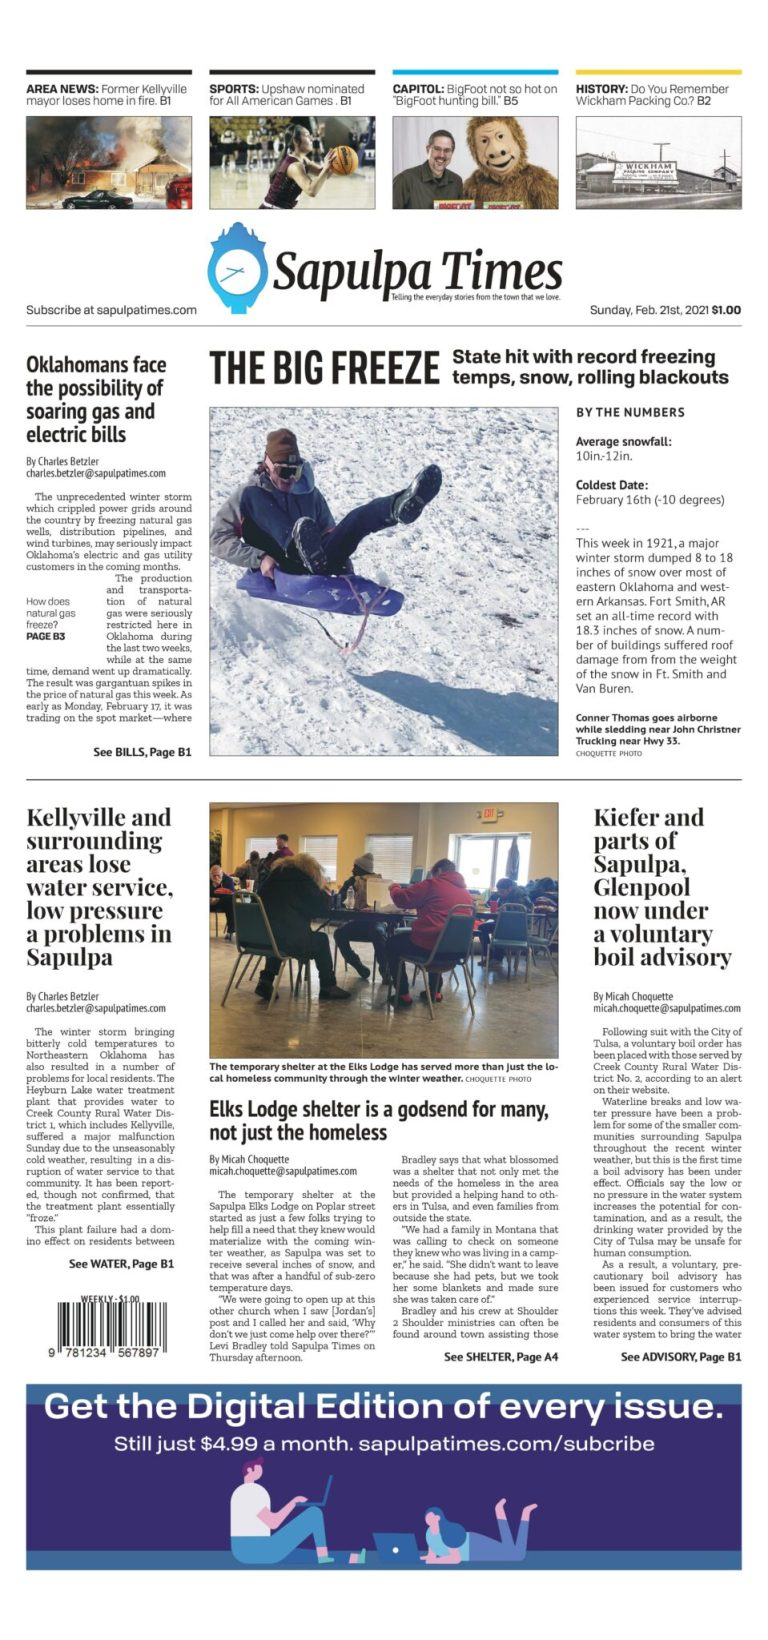 Sapulpa Times Digital Edition 02/21/2021